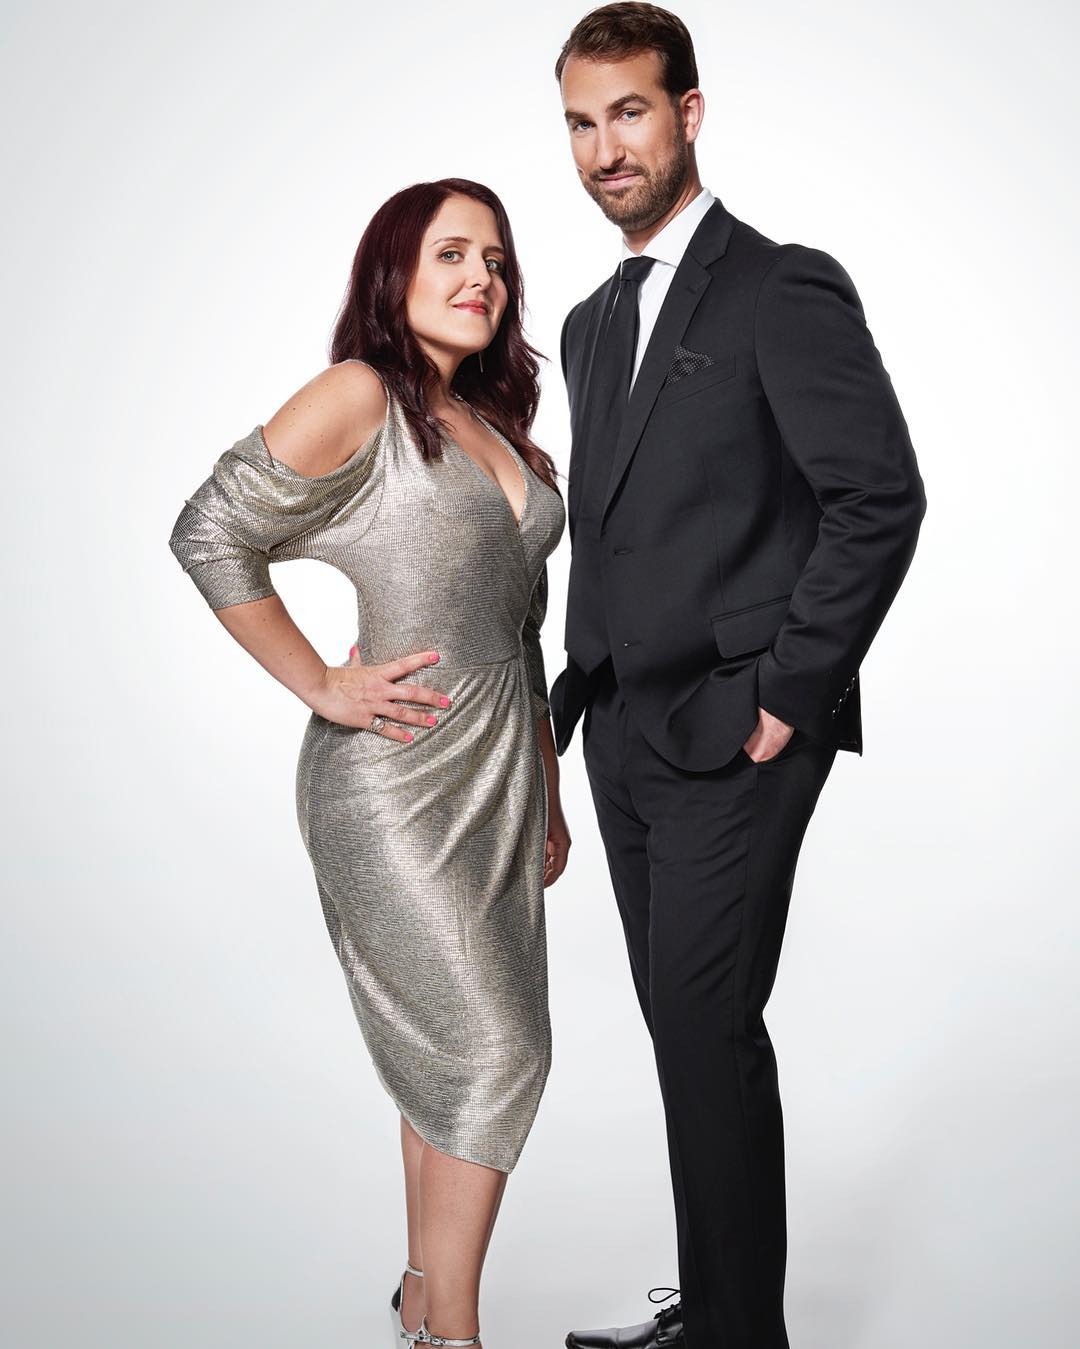 Evan Kaufman & Rebecca Vigil: